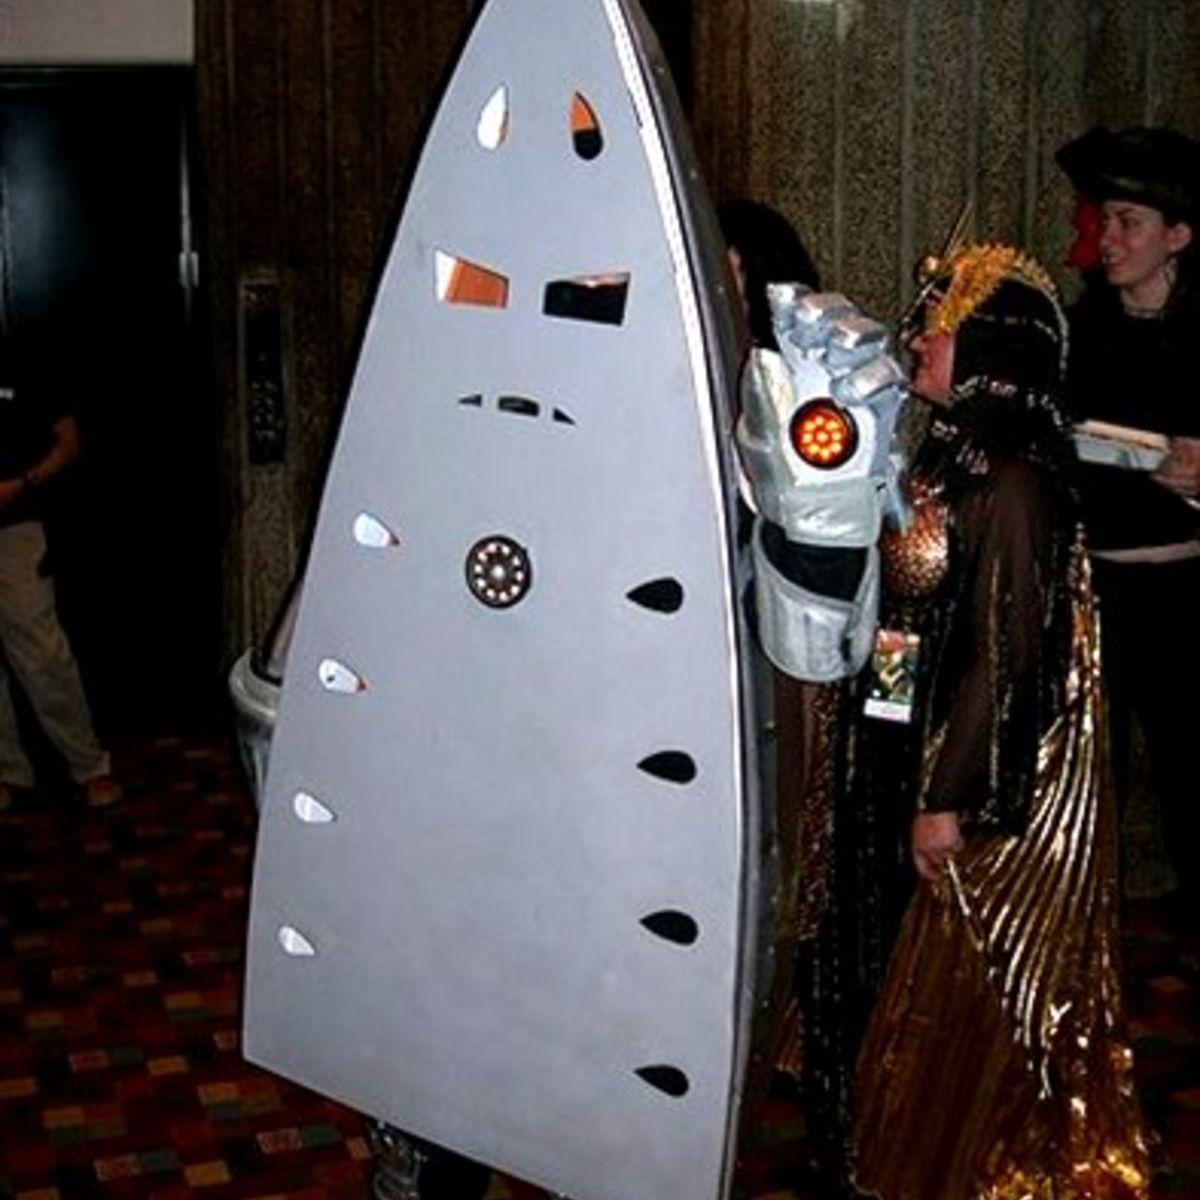 ironman-halloween-costume.jpg